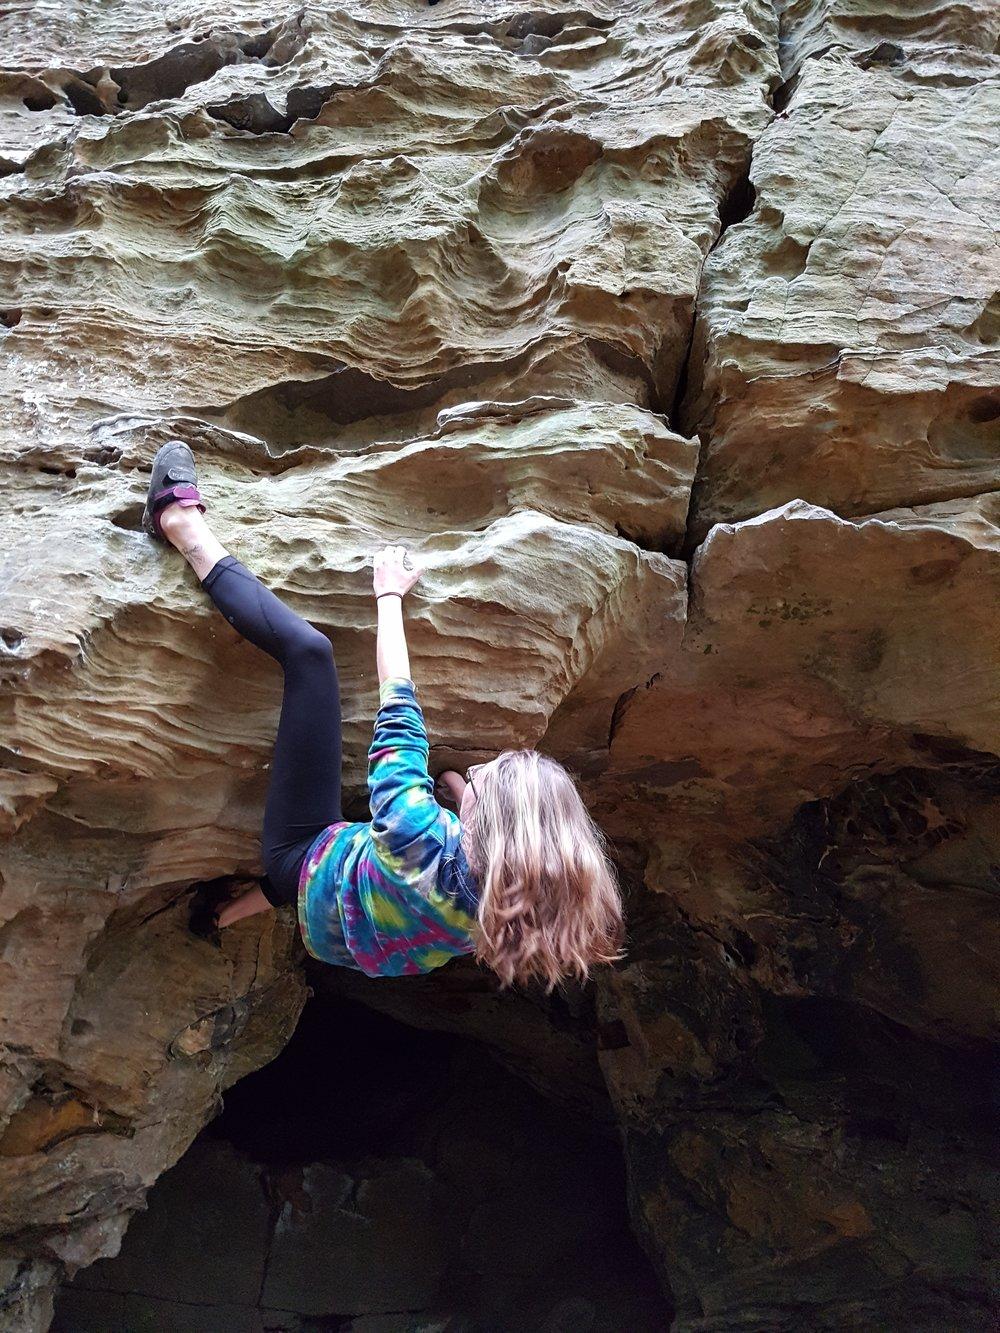 Emily McDermott Rock Climbing Bouldering Woman.jpg